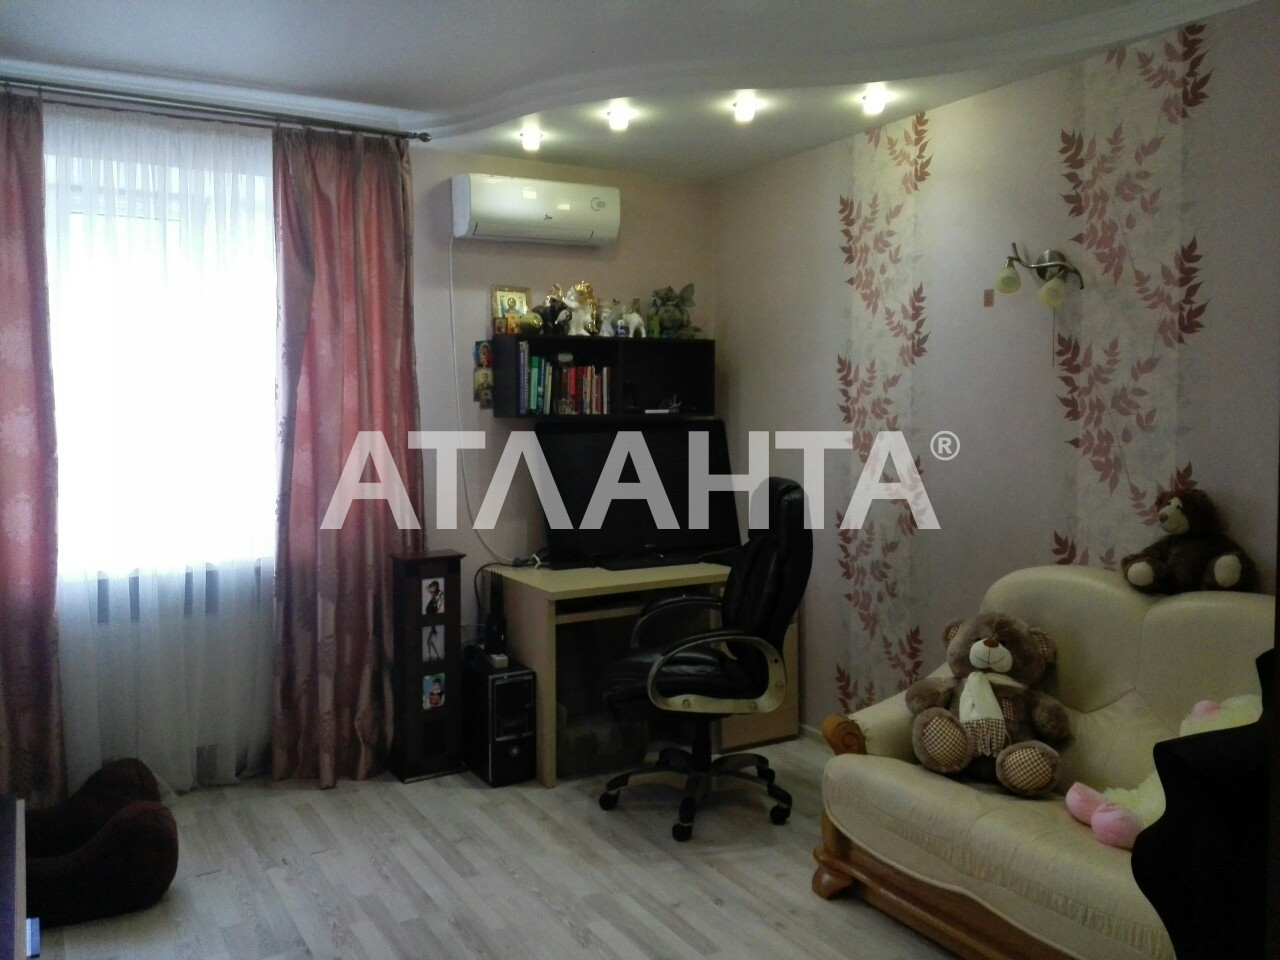 Продается 3-комнатная Квартира на ул. Бабаджаняна Марш. (Рекордная) — 100 000 у.е. (фото №6)